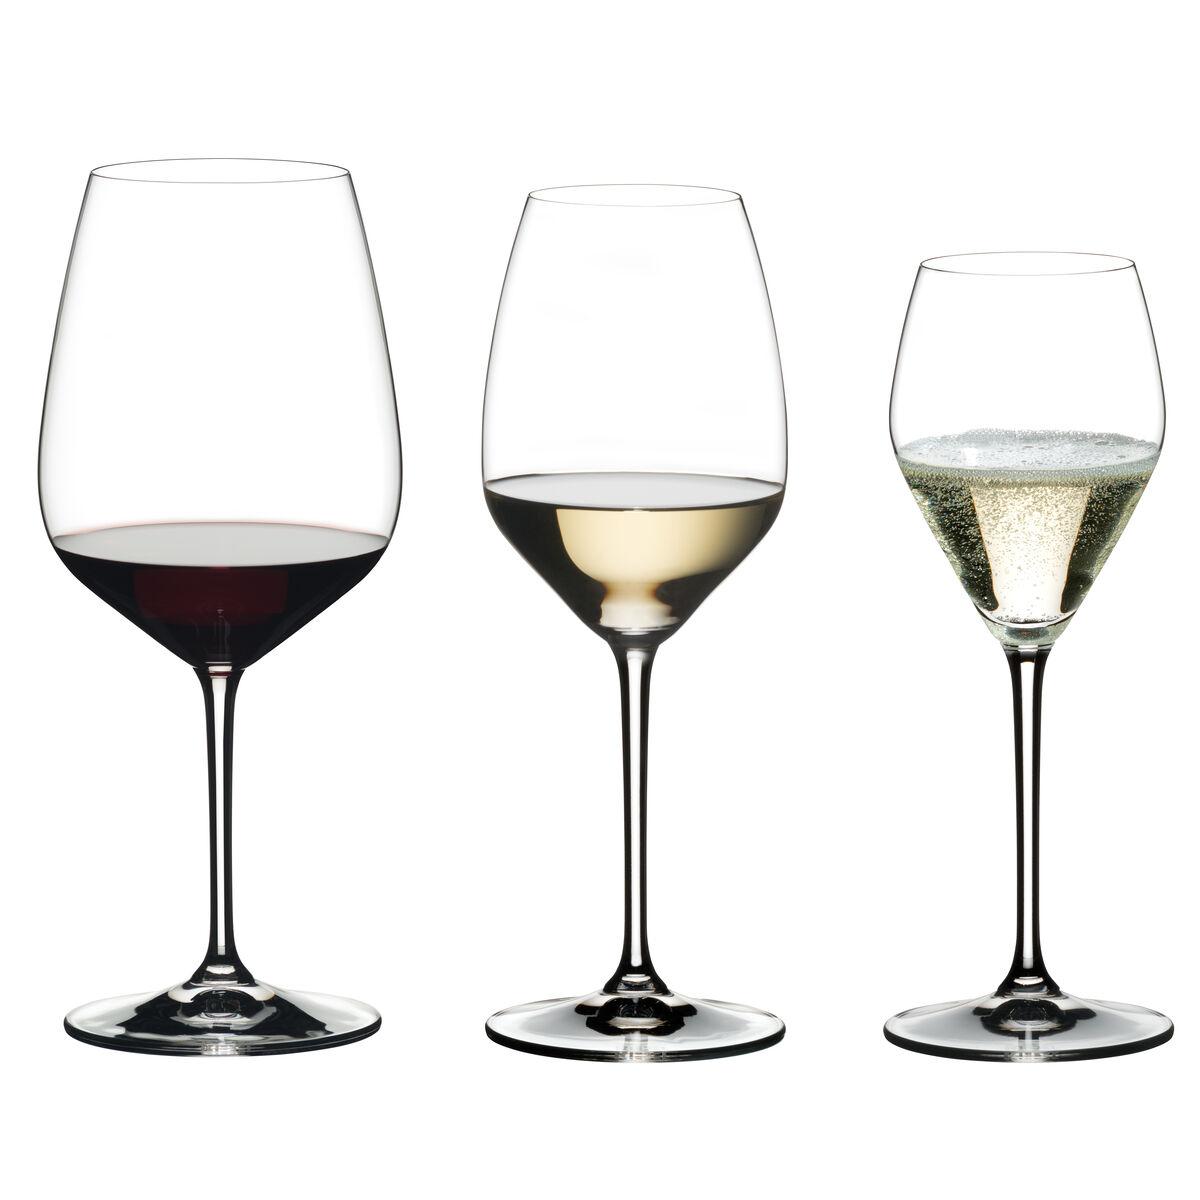 Riedel Extreme Weinglas Set 4x Rotwein 4x Weißwein 4x Sekt